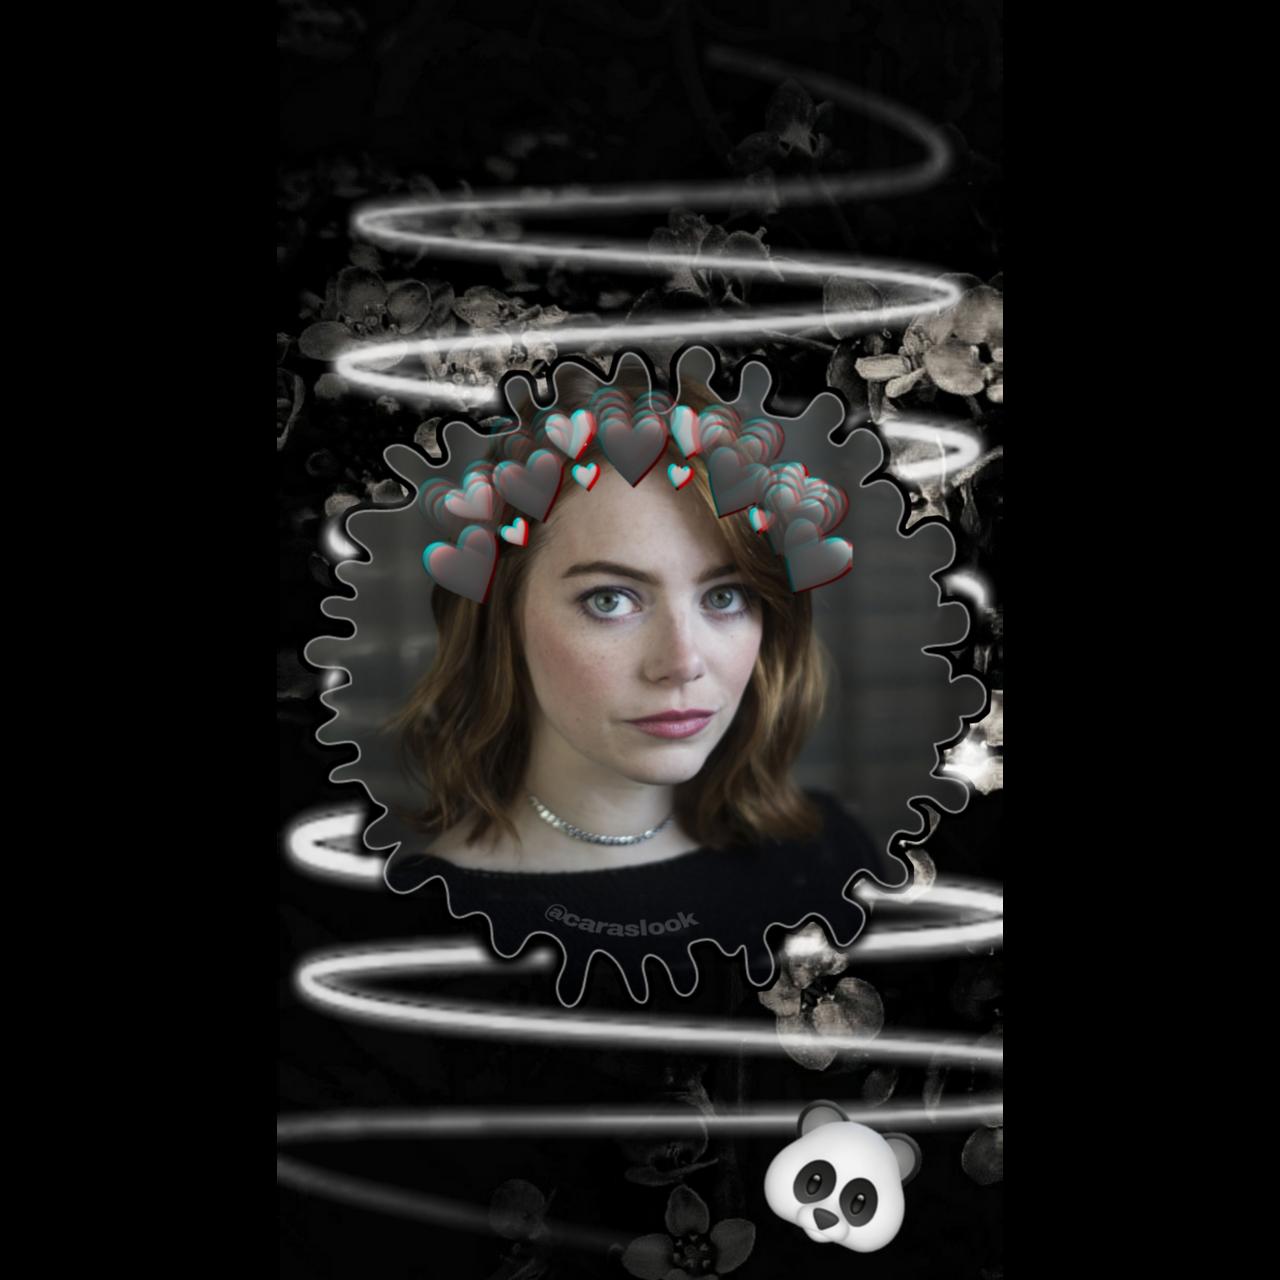 Emma Stone Black Aesthetic Wallpaper By Juli3569 On Deviantart